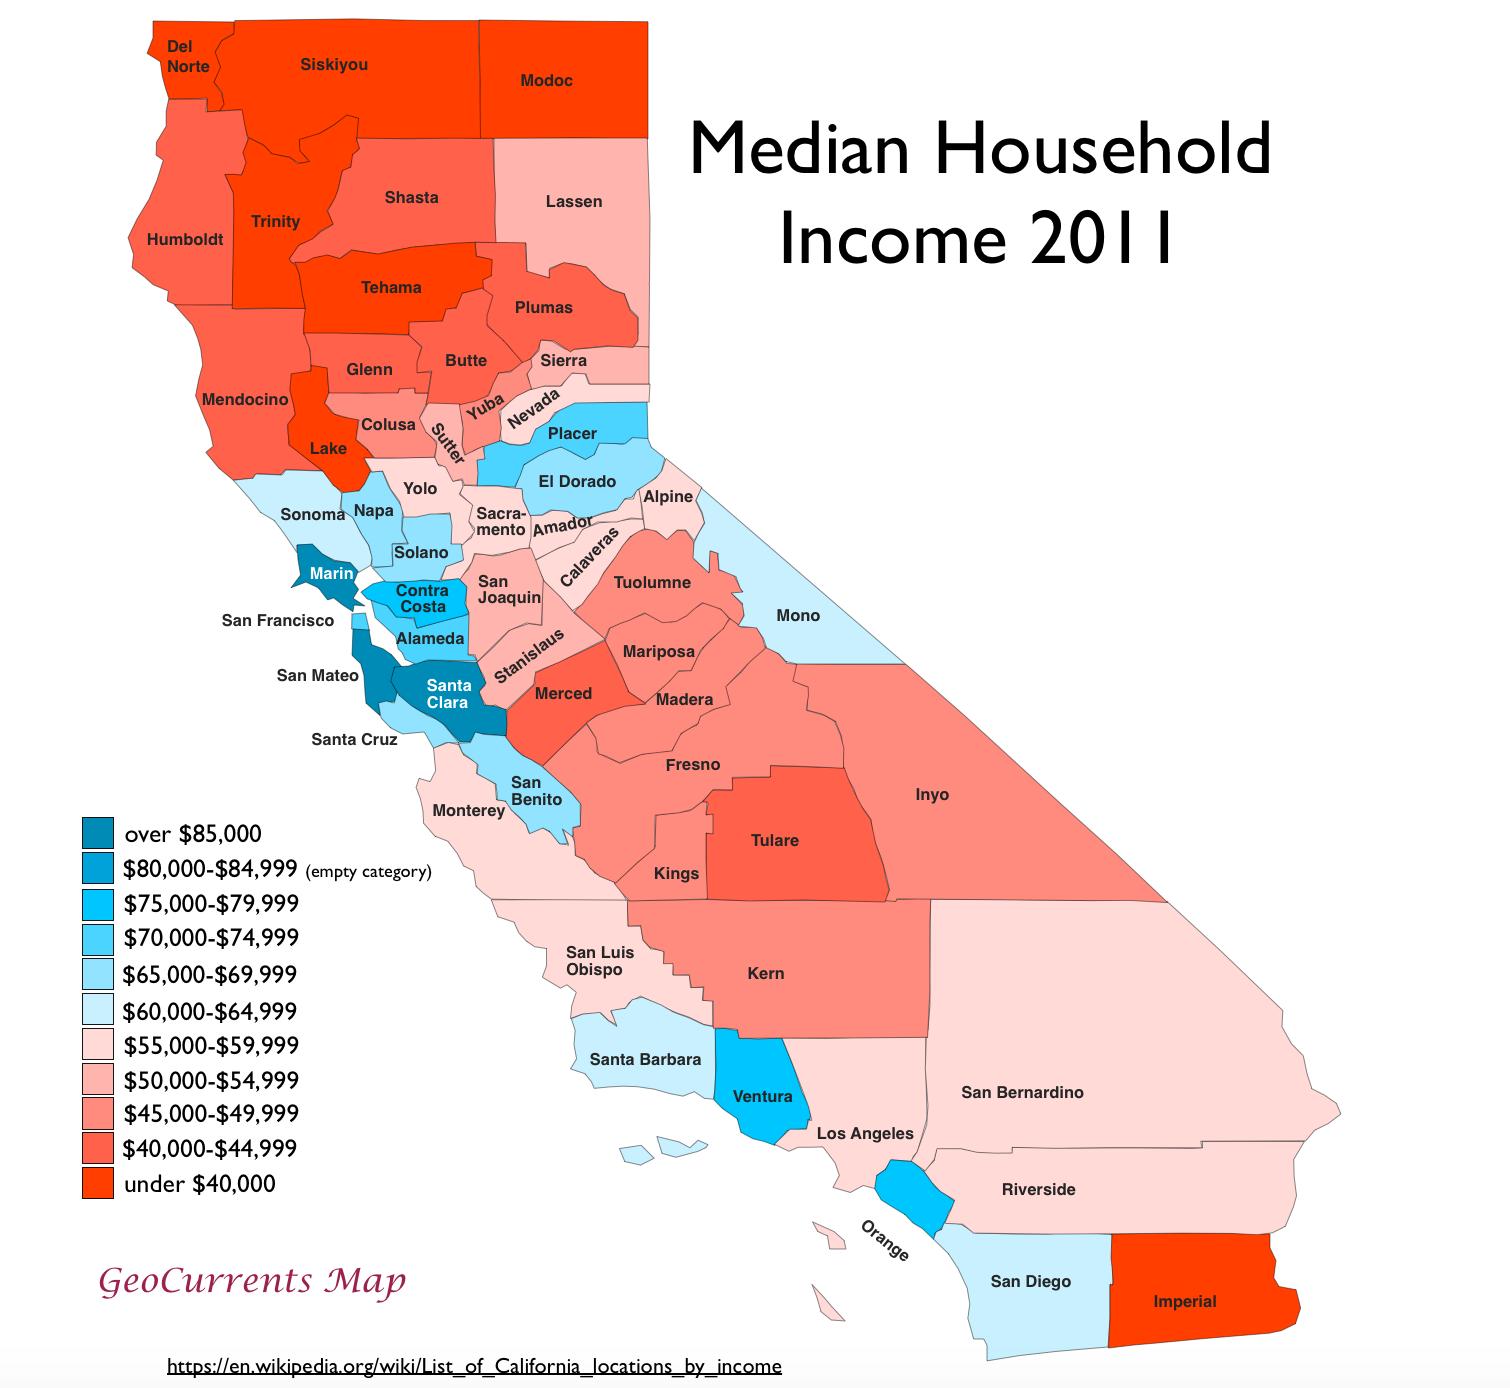 The Regionalization of California Part 1 GeoCurrents